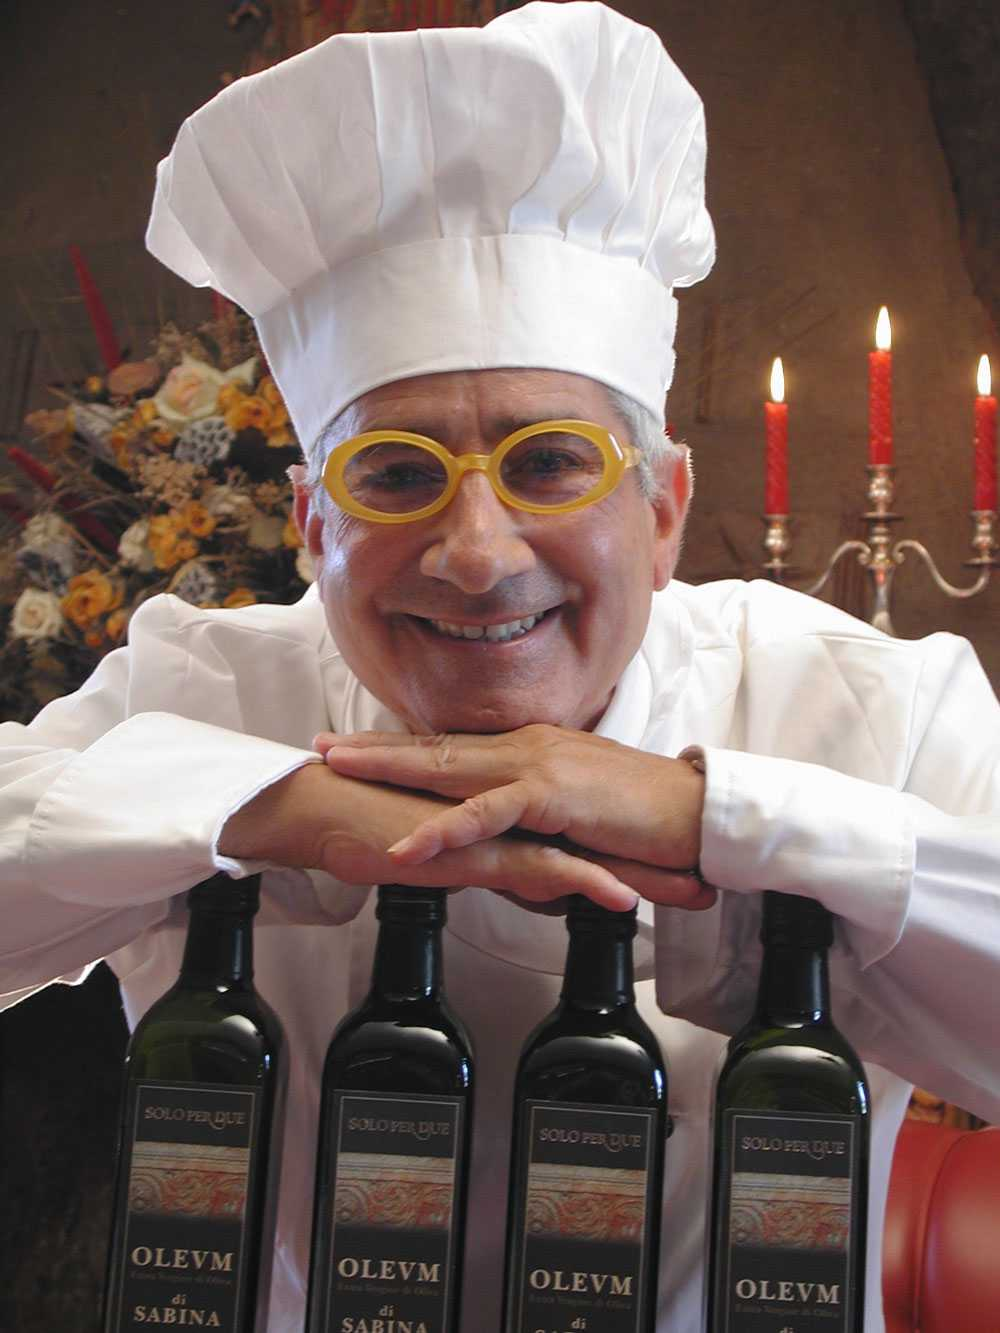 Remo Di Claudio äger restaurangen.